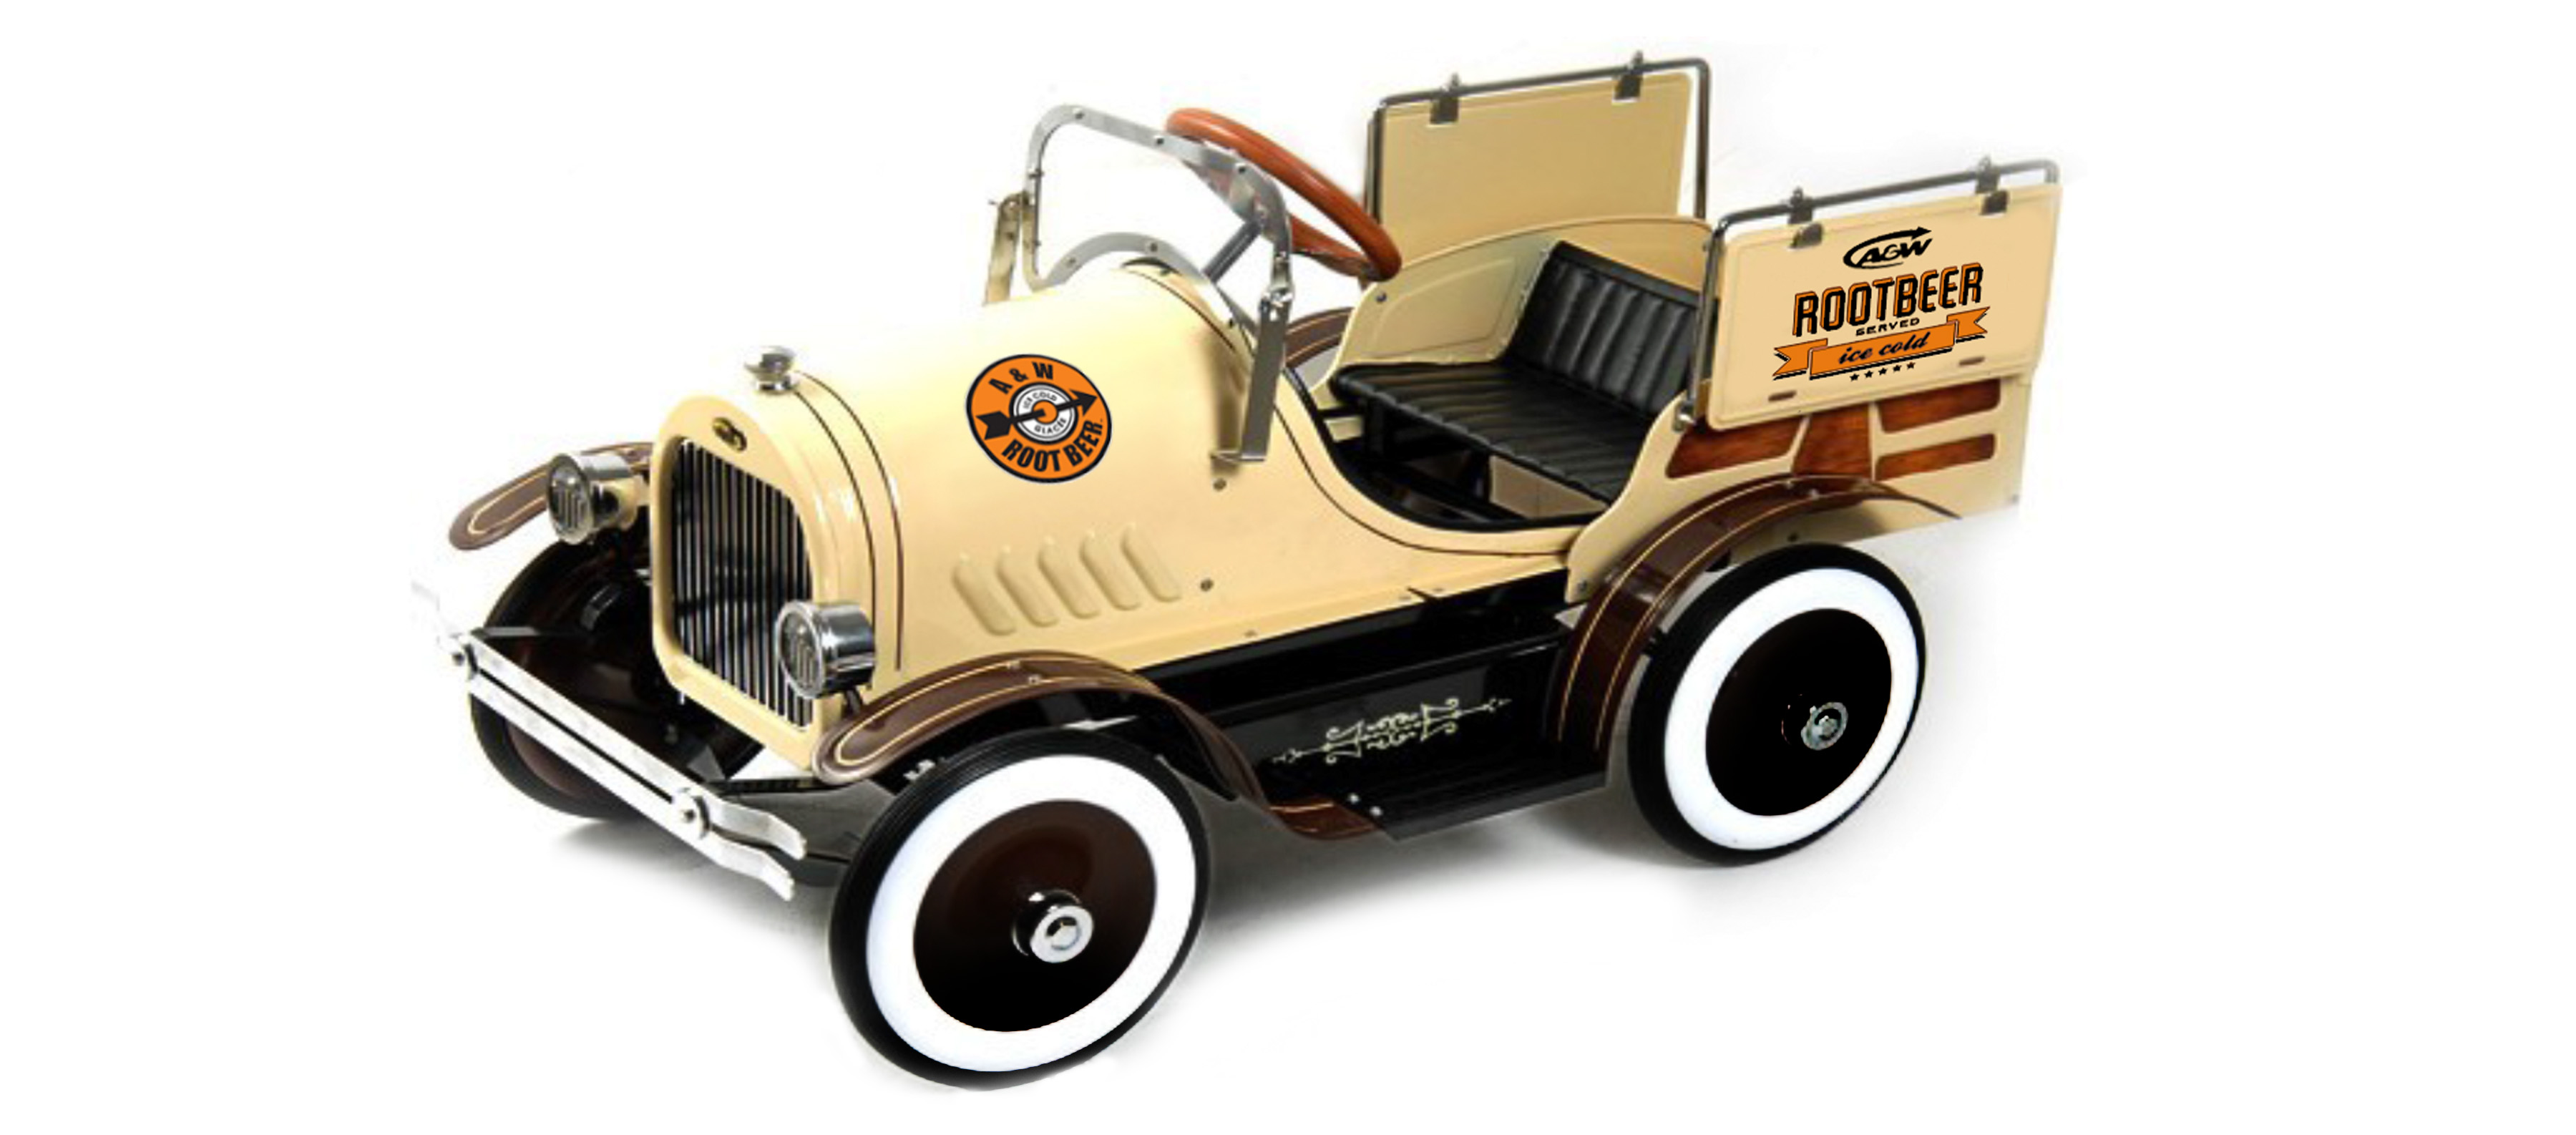 rootbeer pedal car